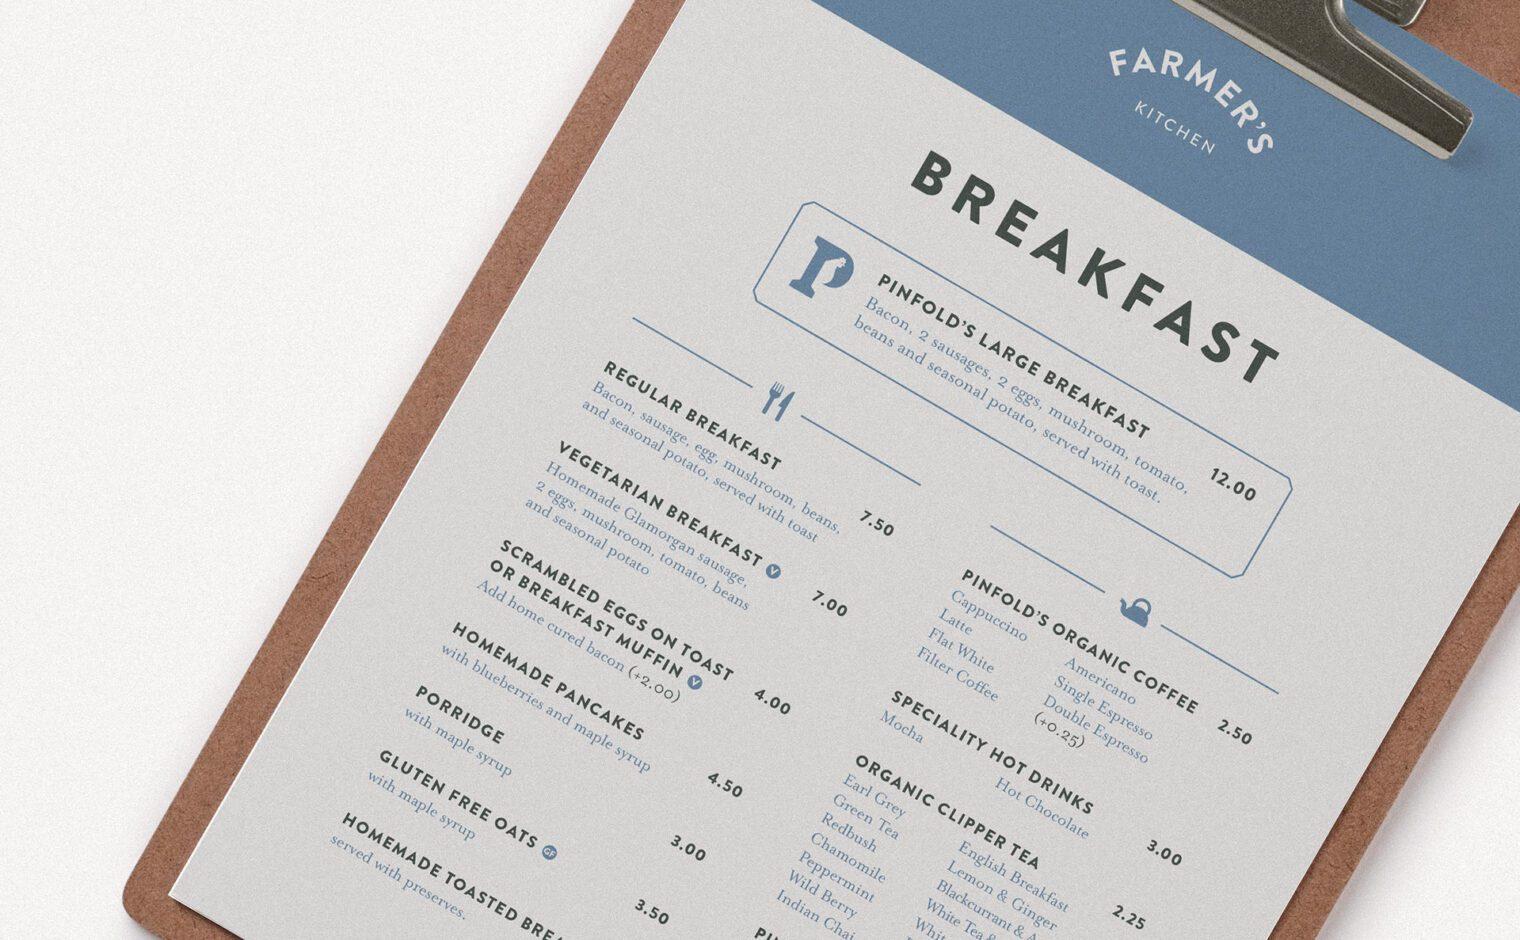 Pinfold Farm Shop breakfast menu detail